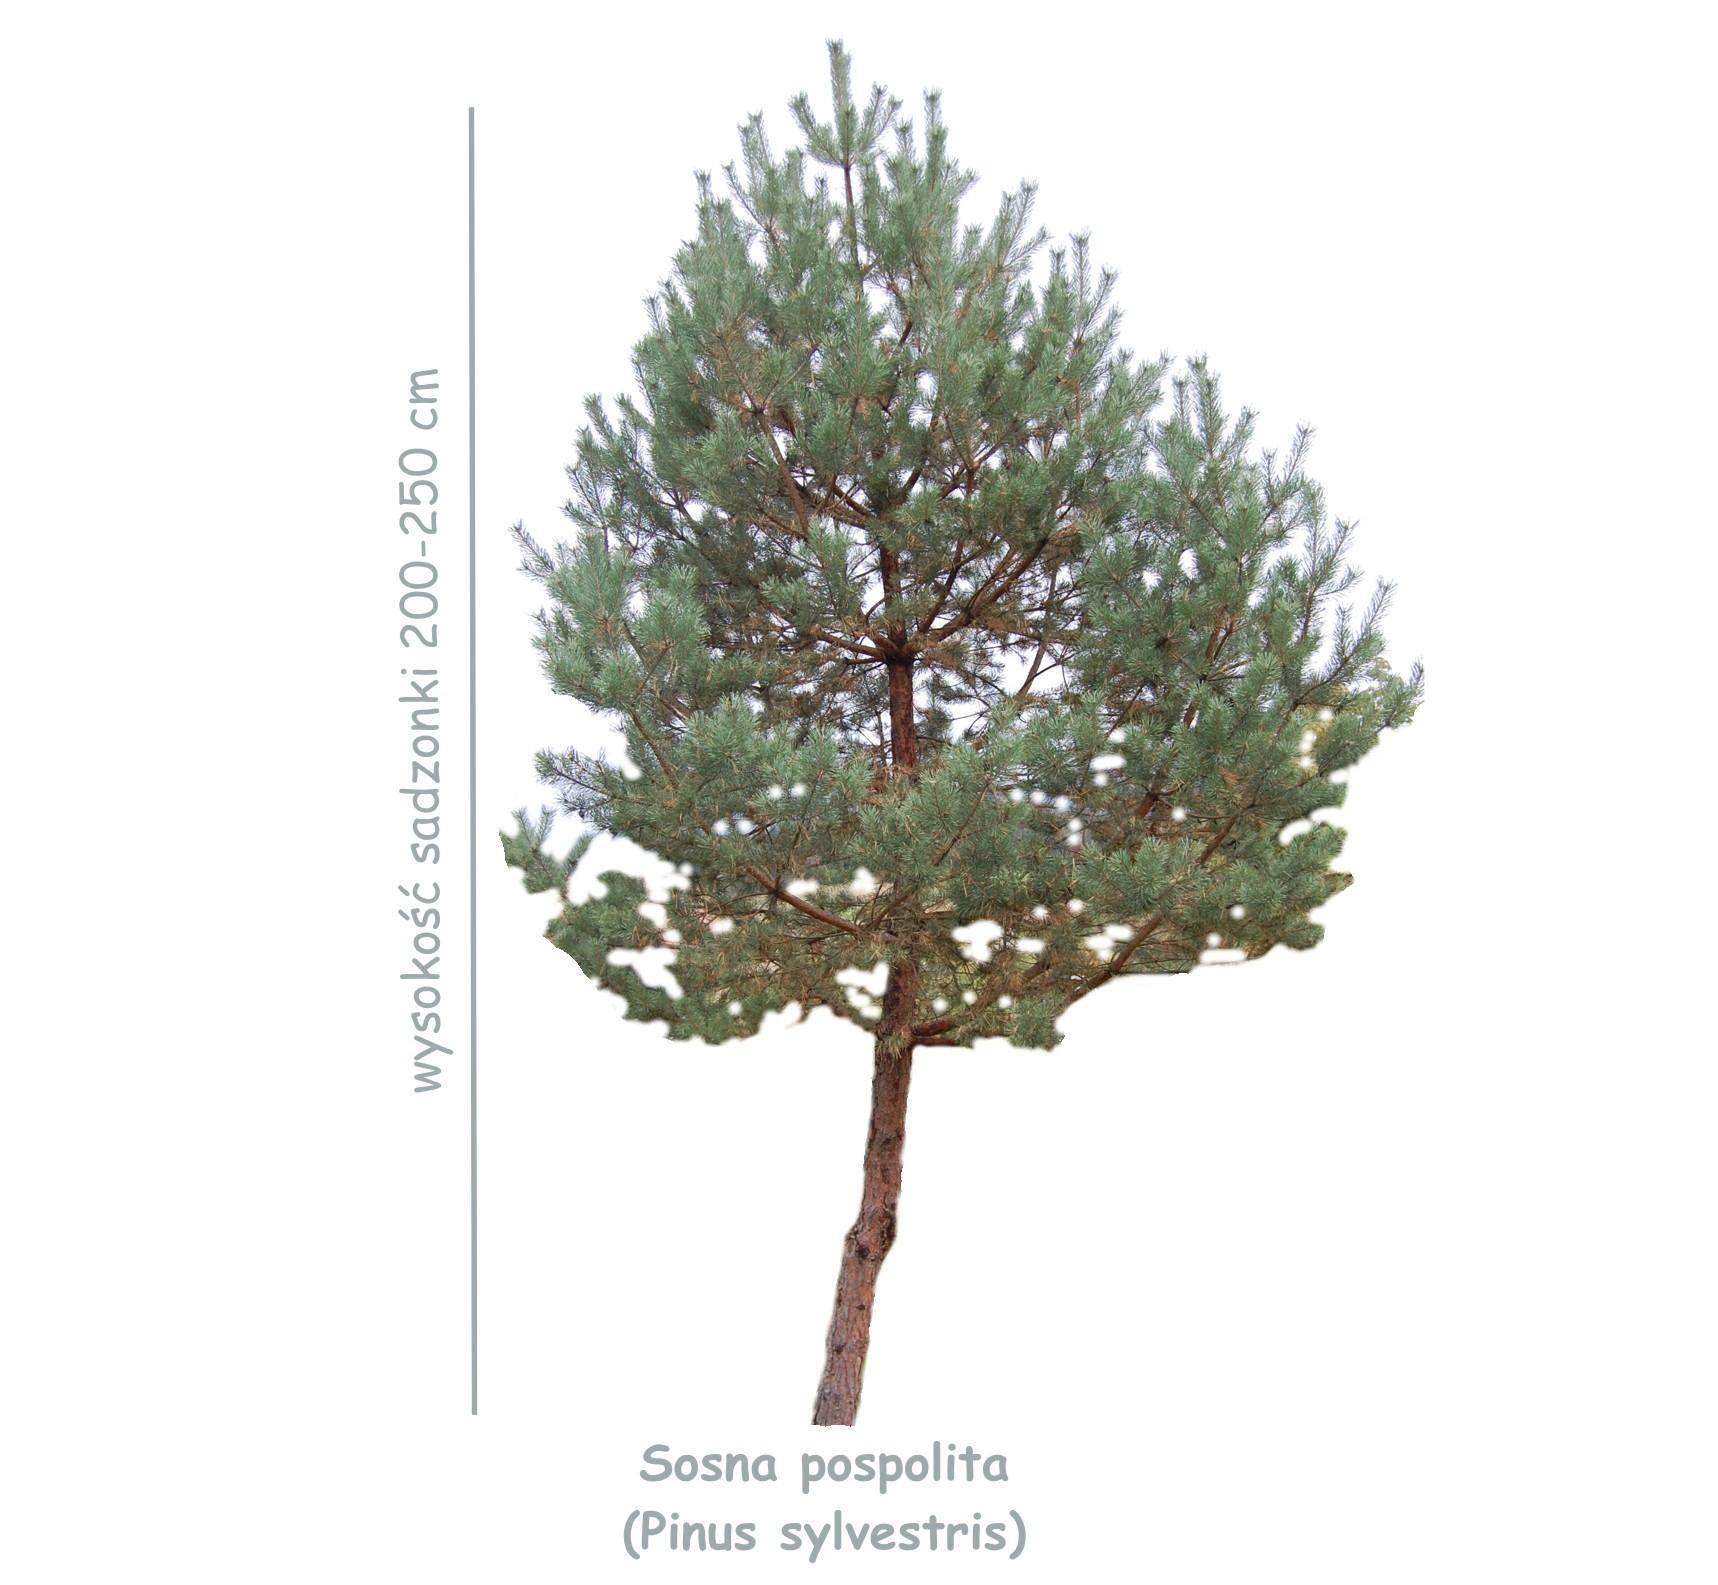 Sosna pospolita (Pinus sylvestris) sadzonka o wysokości 200-250 cm